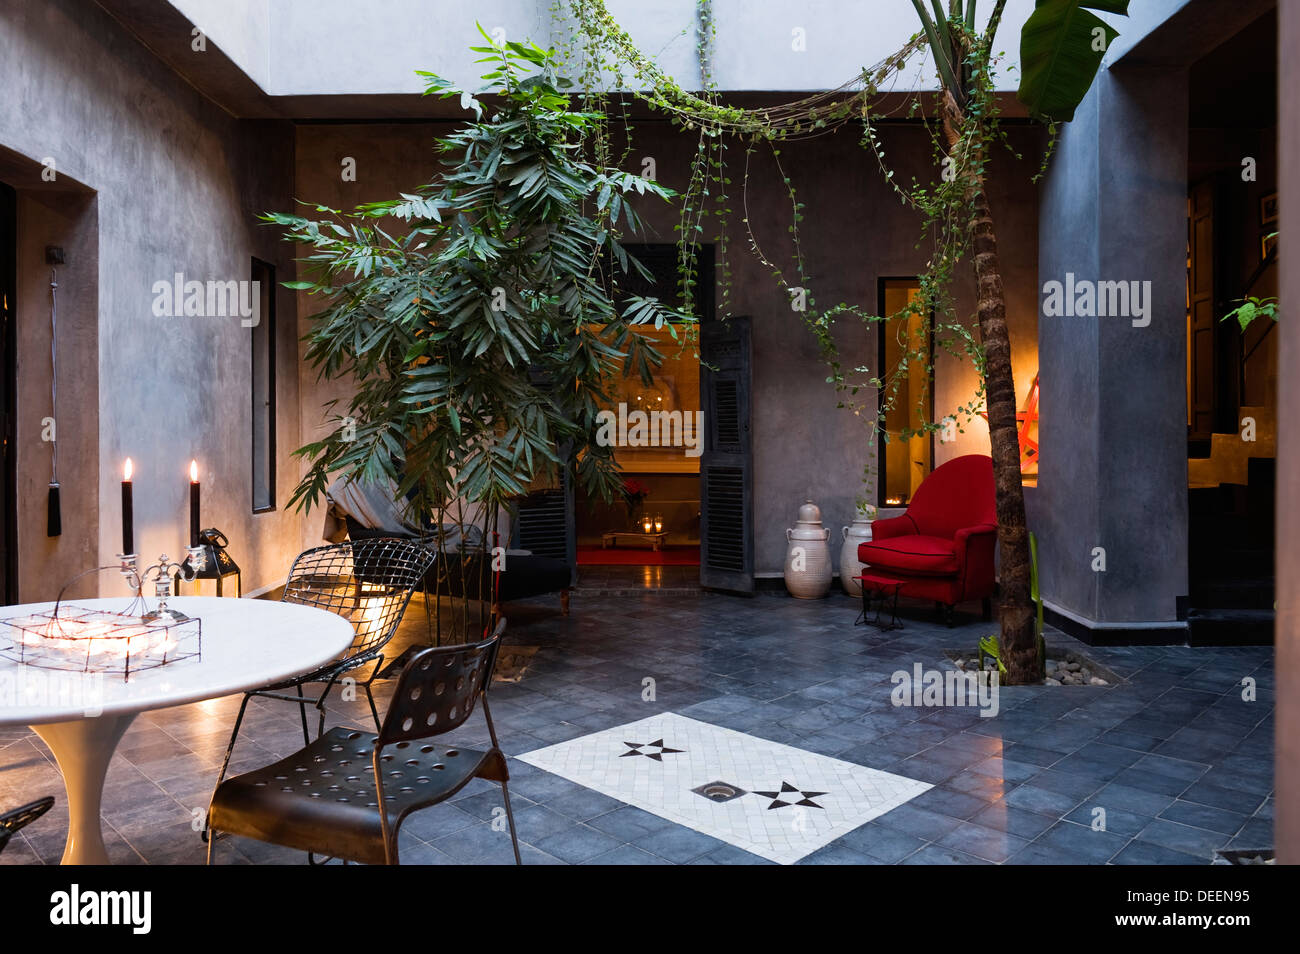 Marrakech cortile con piante di banana e palm tree con un pallido